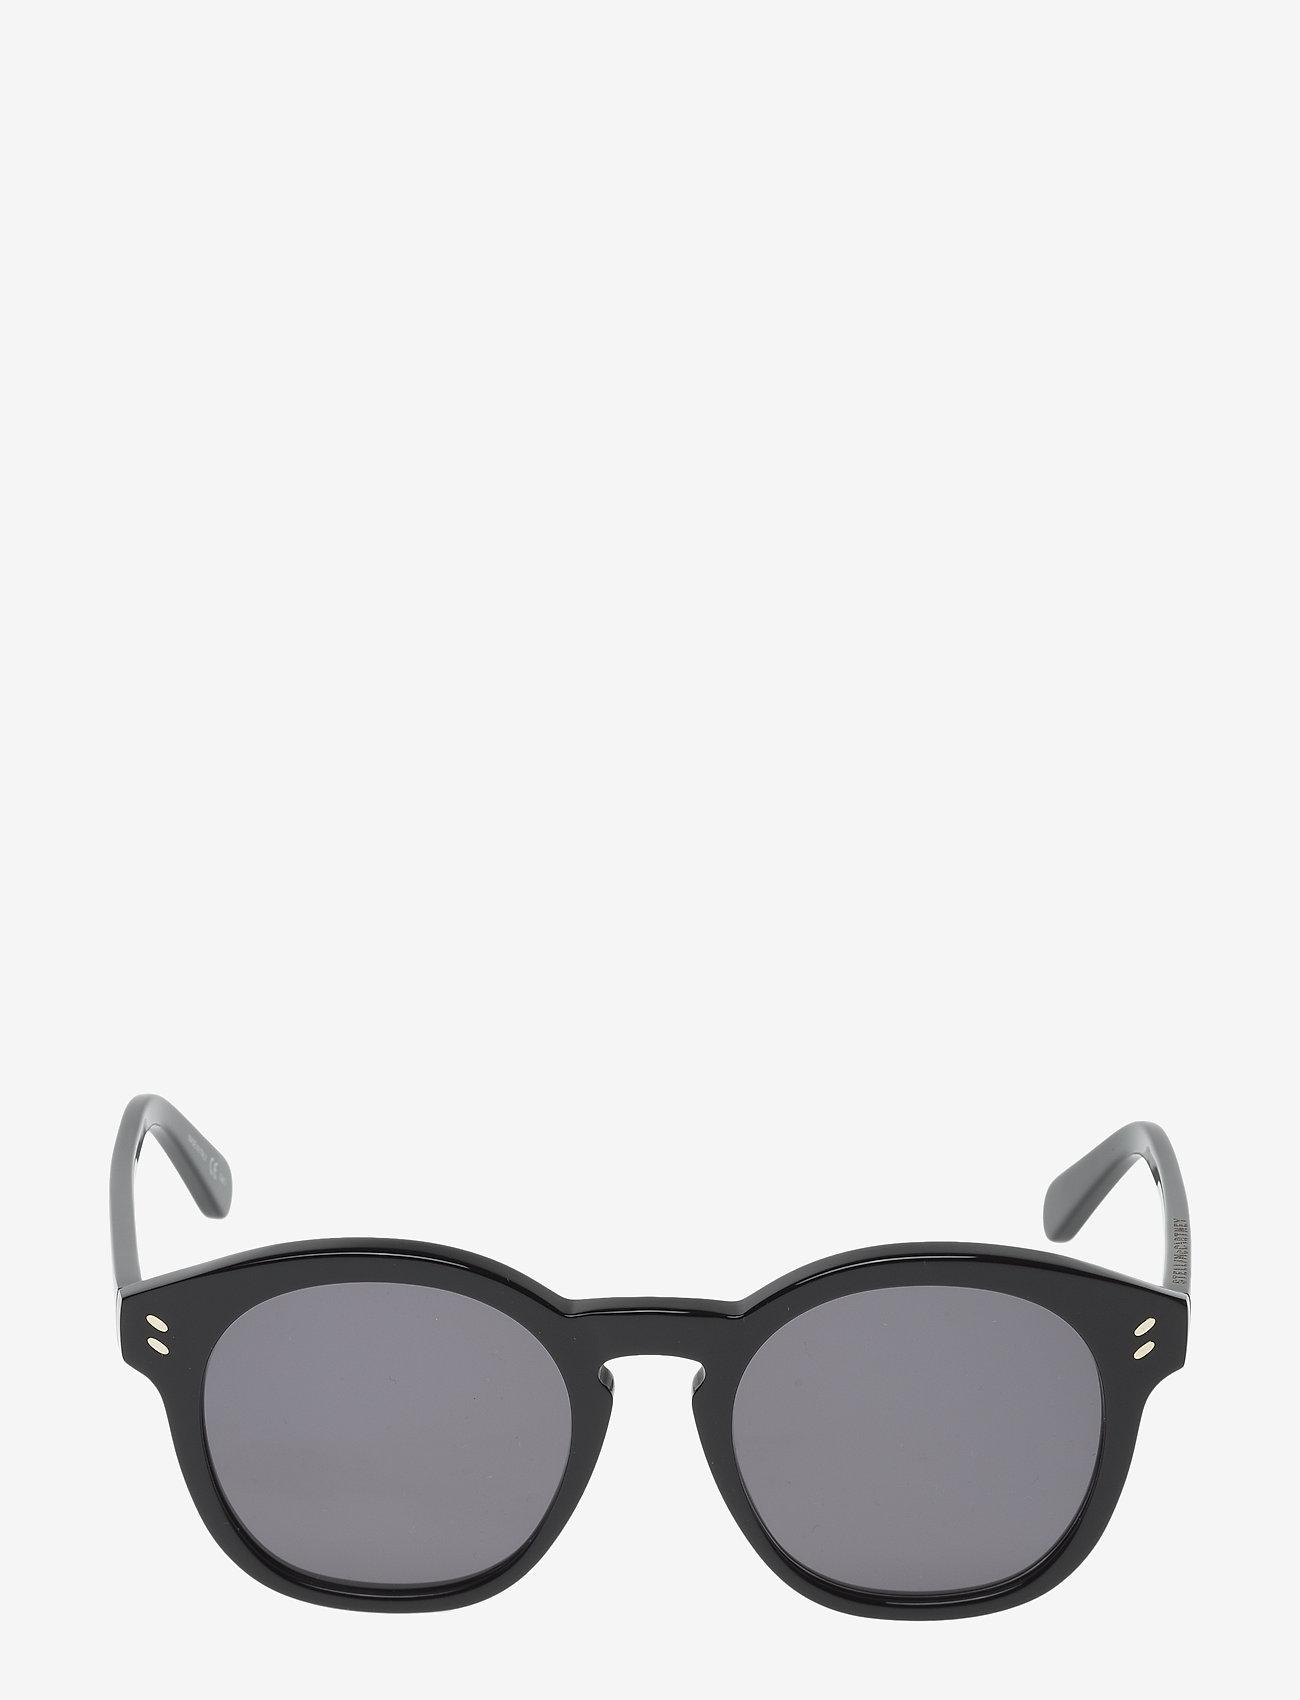 Stella McCartney Eyewear - SC0013S - rond model - black-black-grey - 0